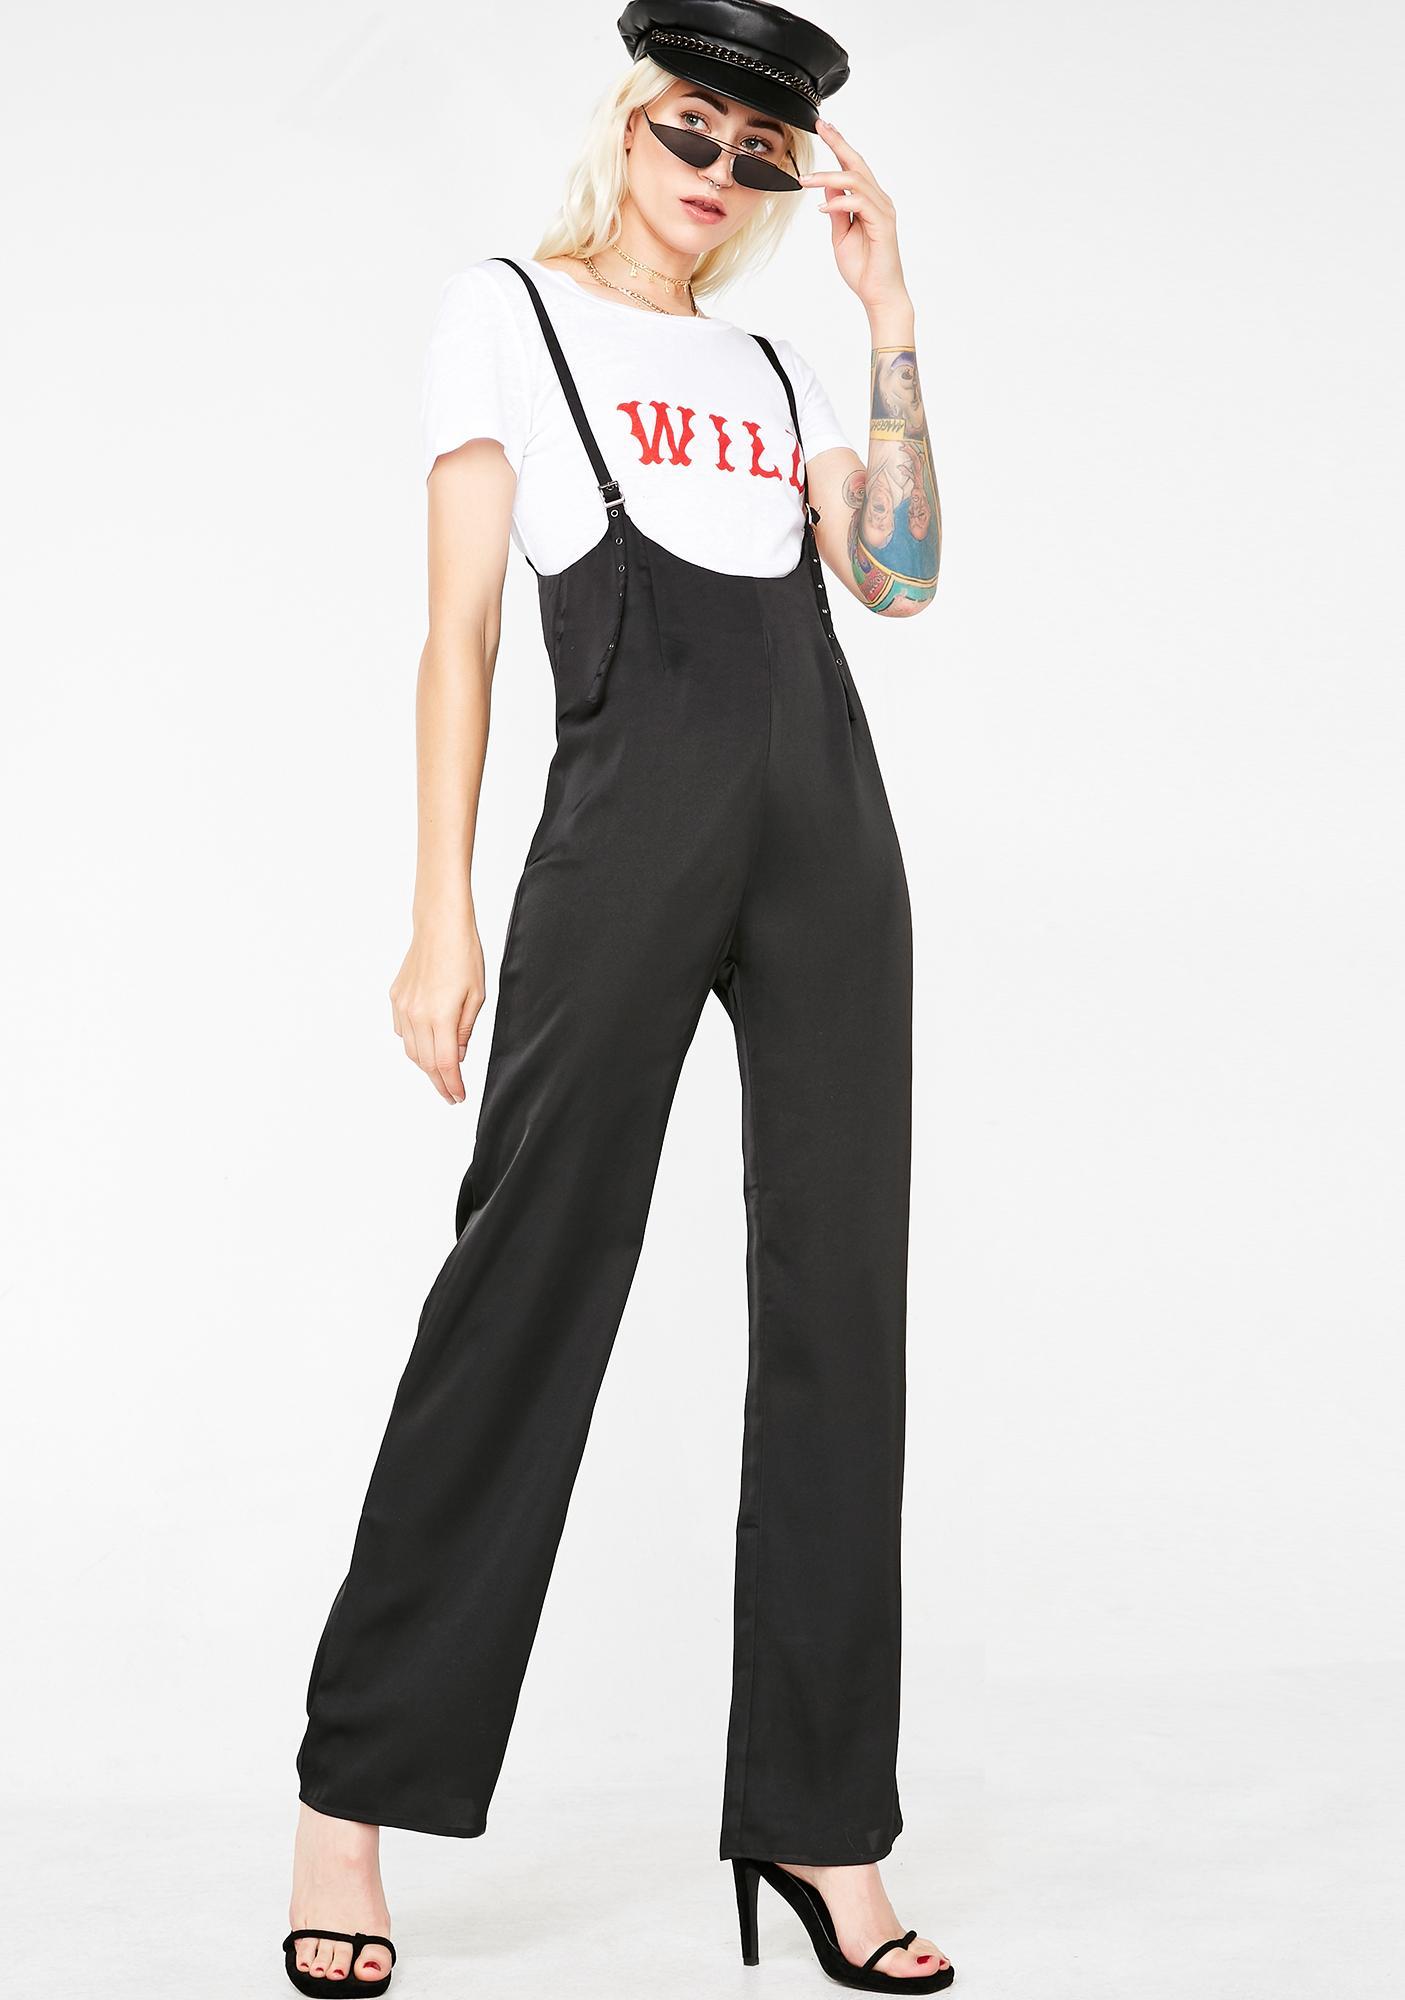 Lady Luxury Suspender Jumpsuit